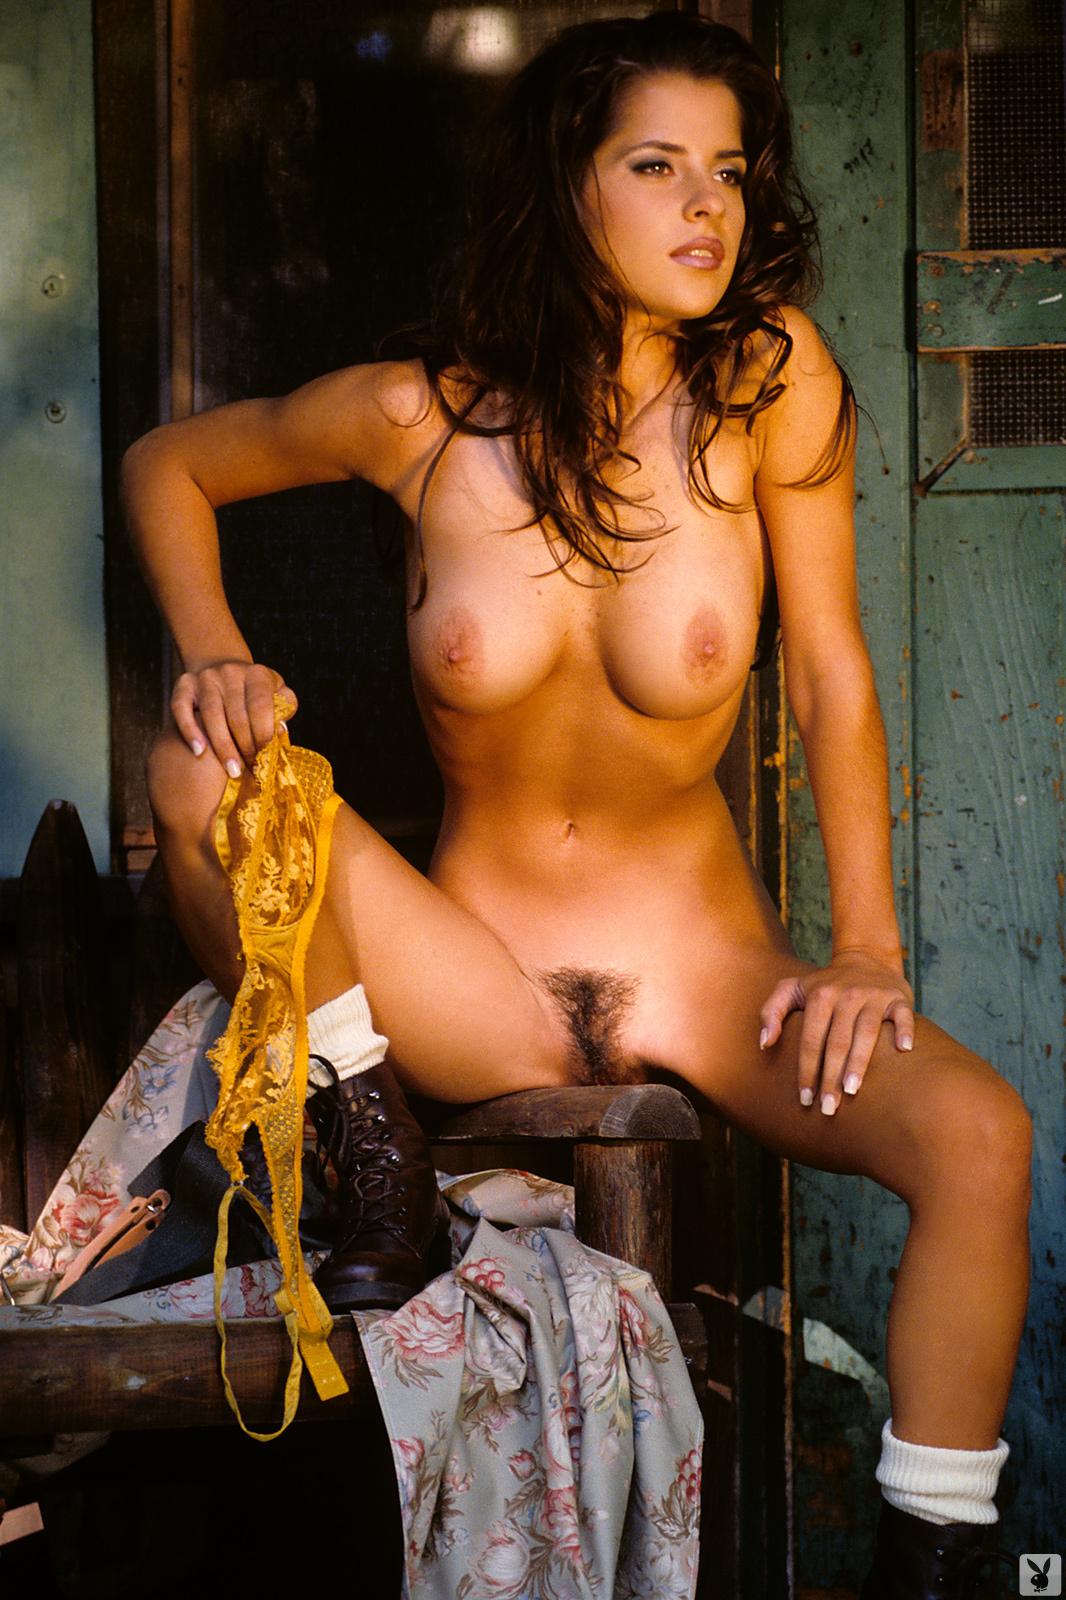 kelly-monaco-boobs-naked-playmate-april-1997-playboy-16